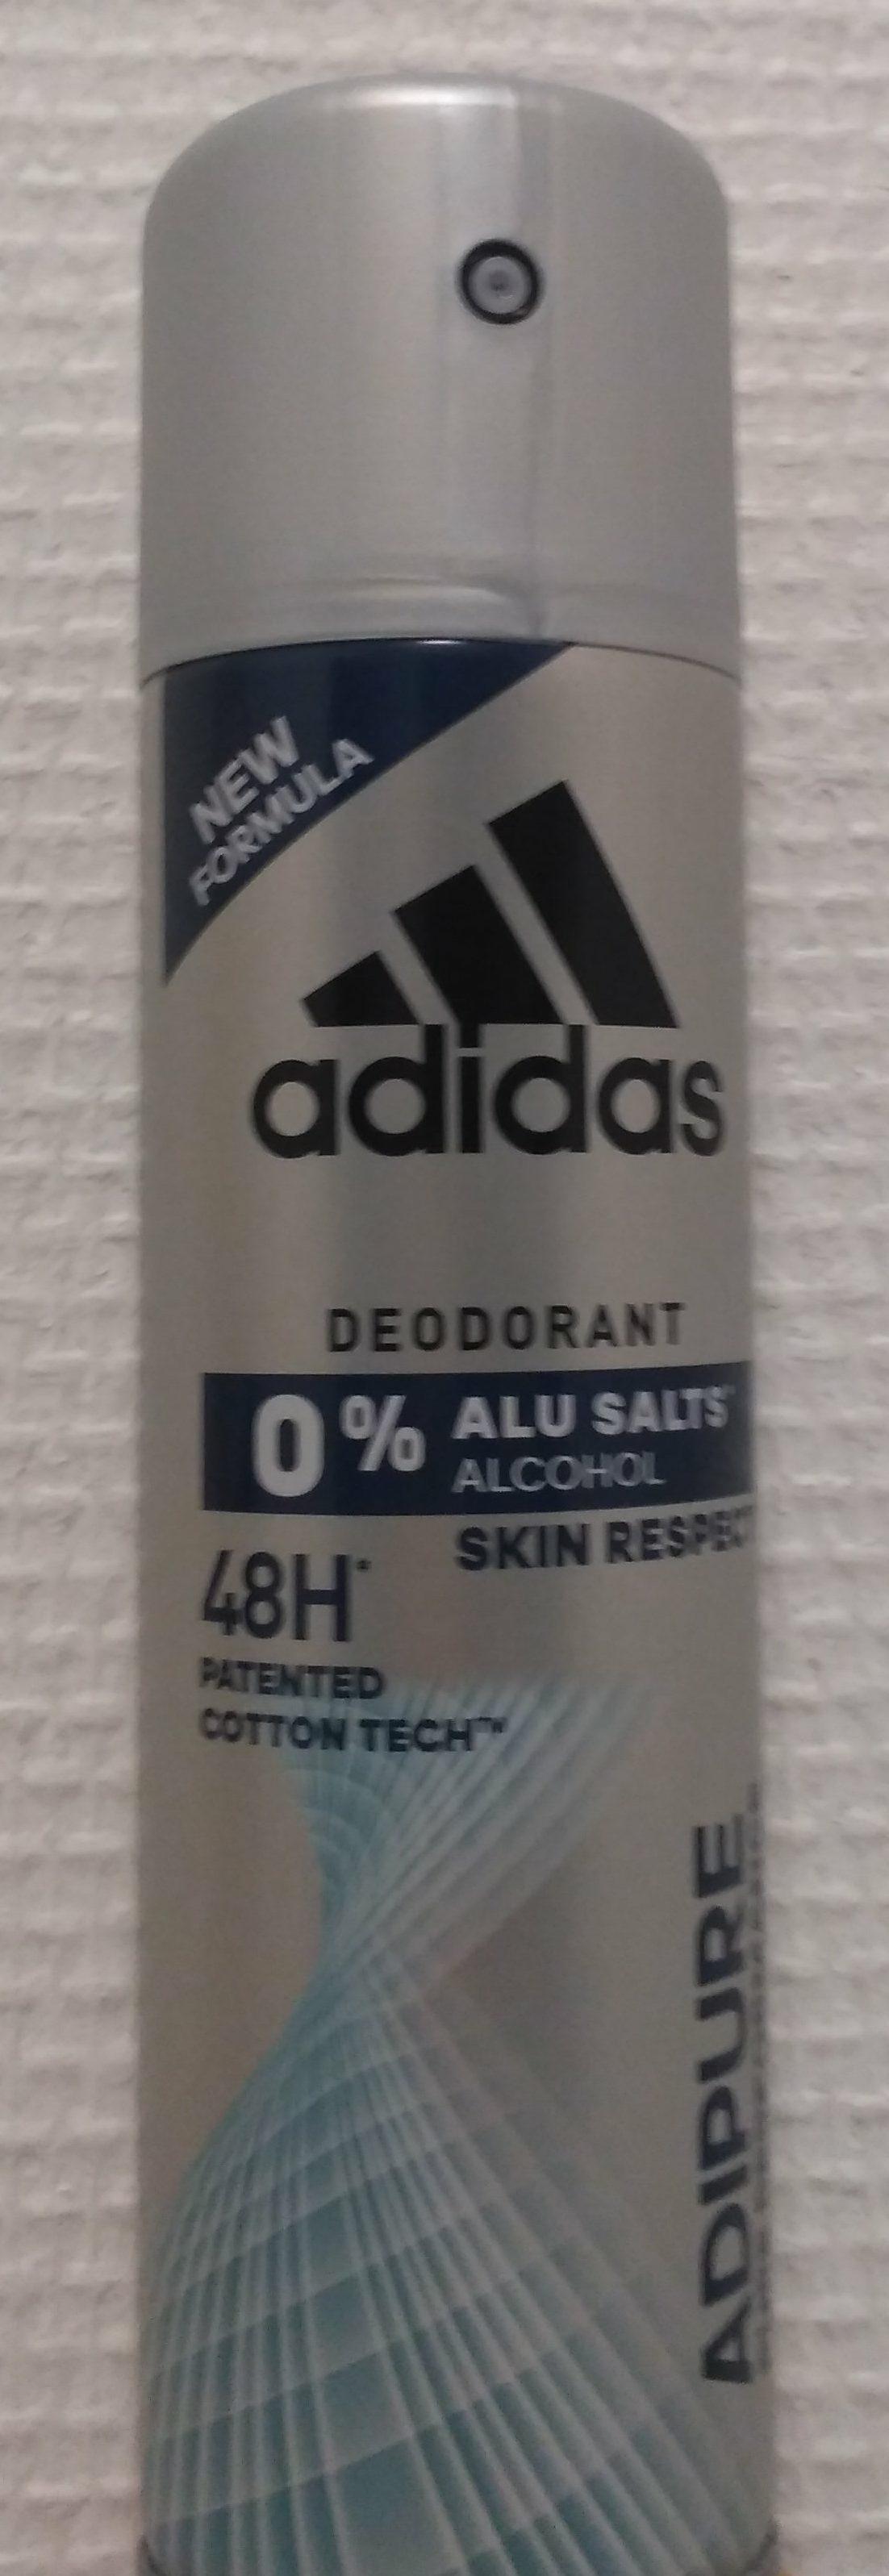 Déodorant Adipure - Product